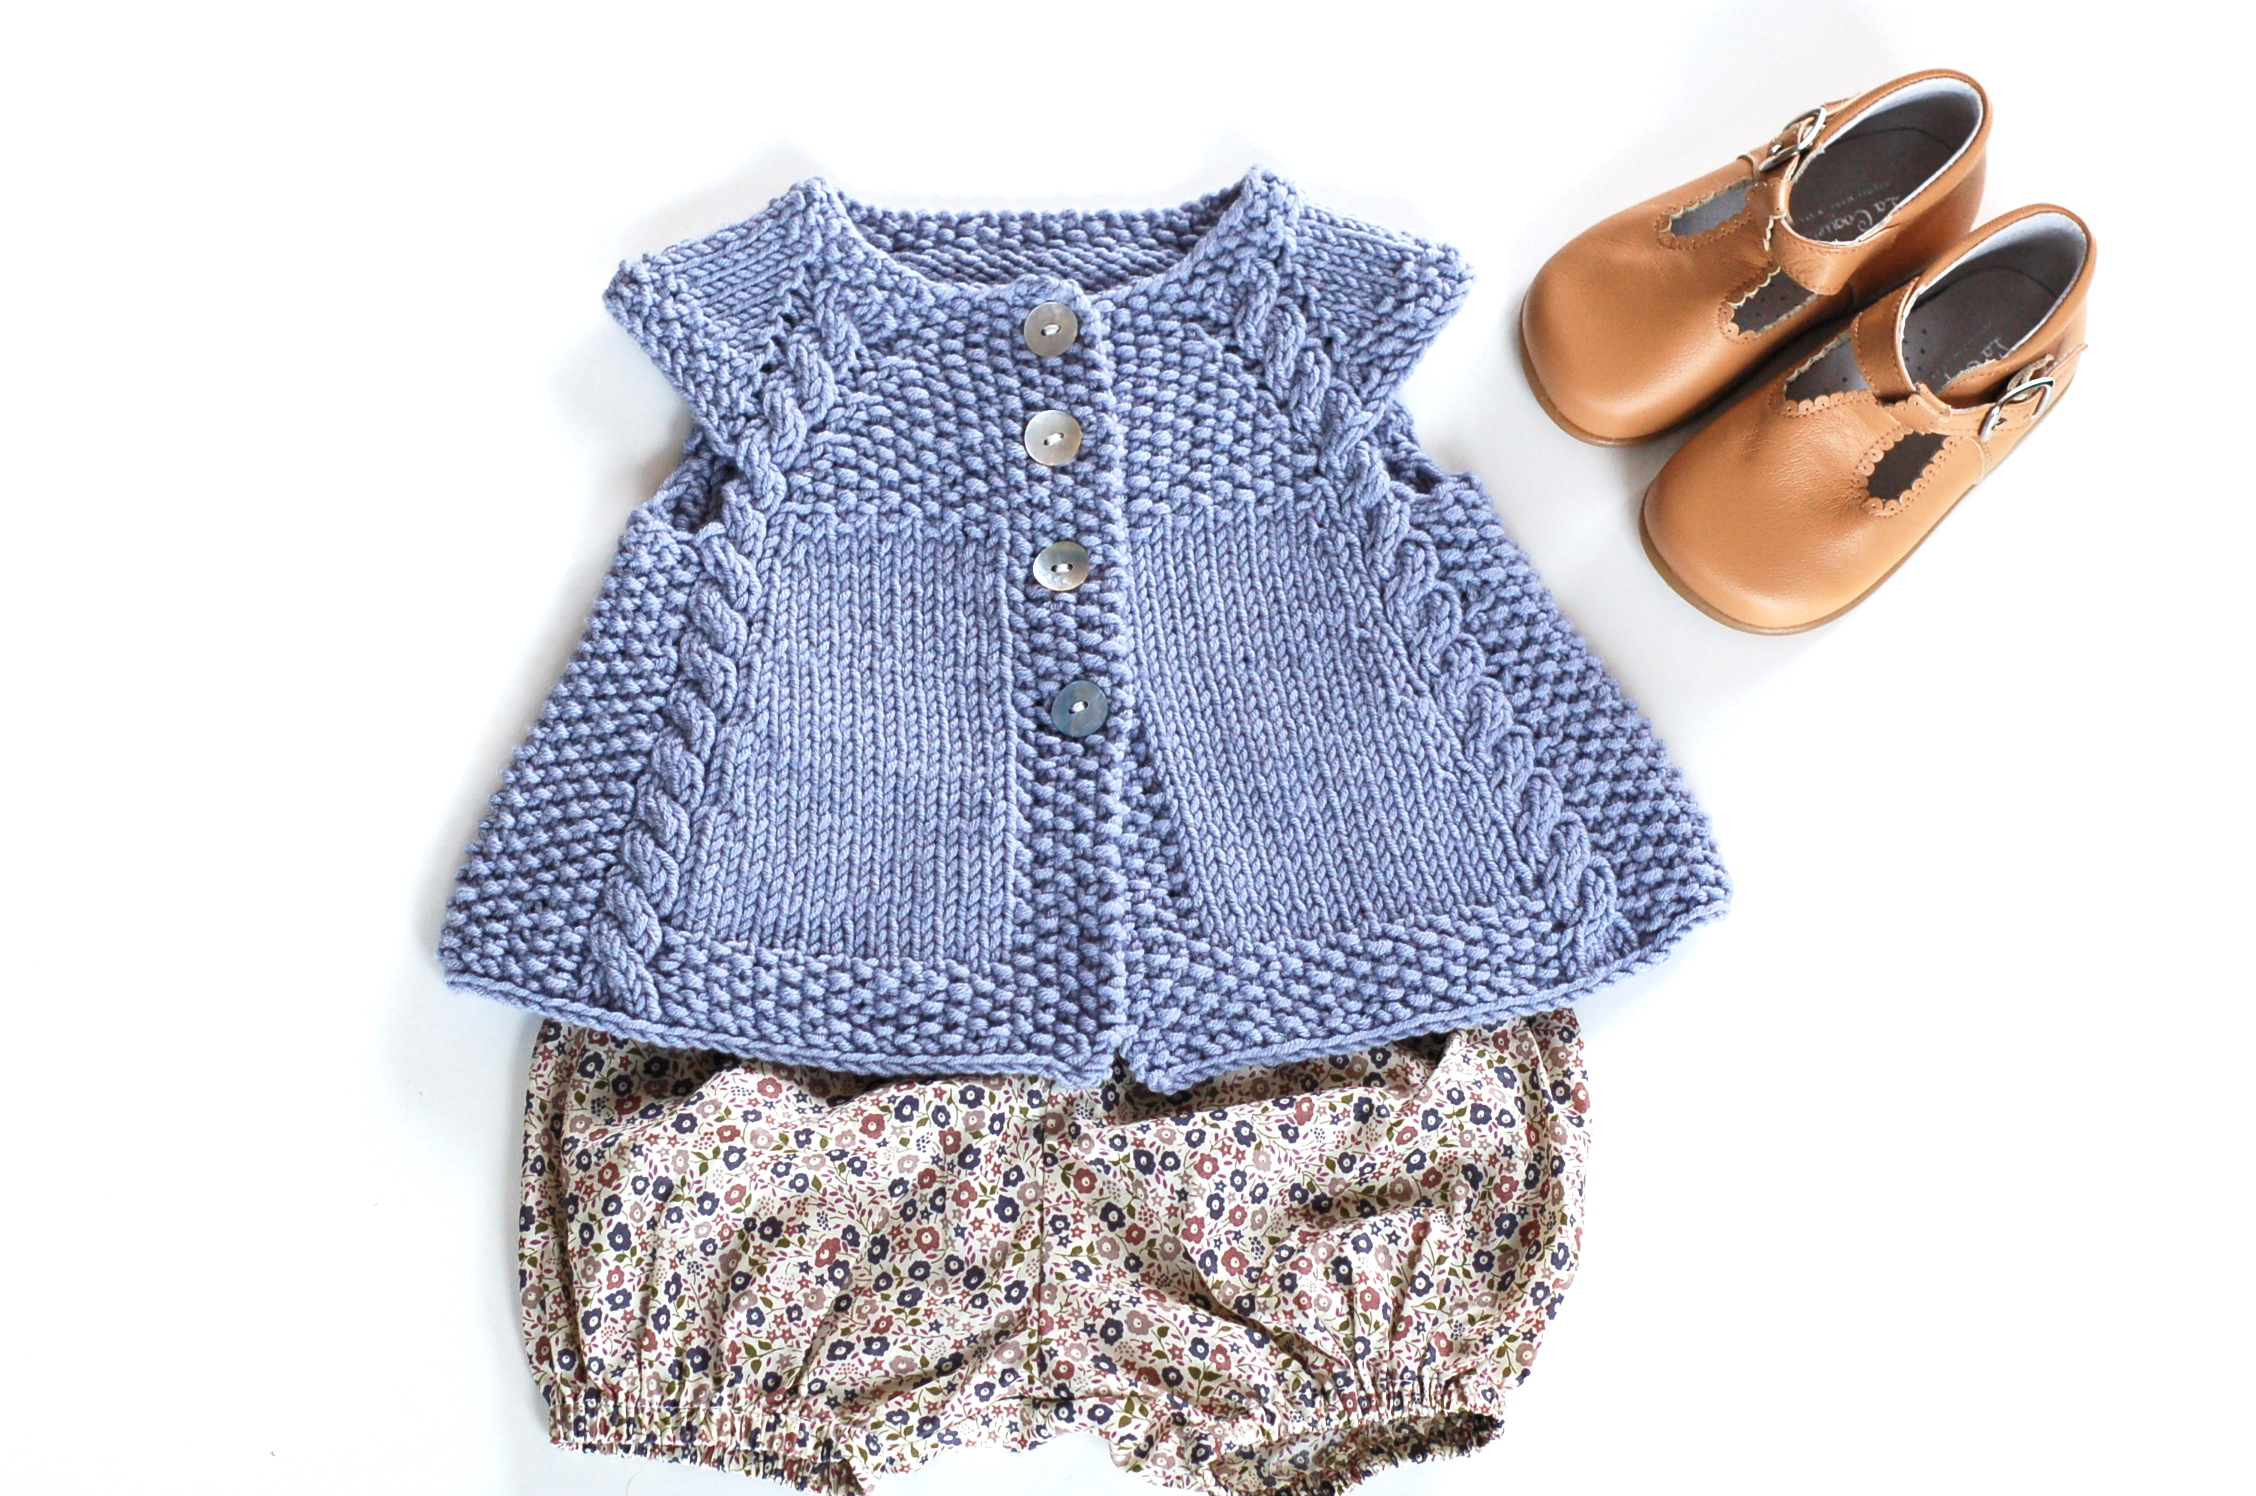 Powder Blue by Frogginette Knitting Patterns